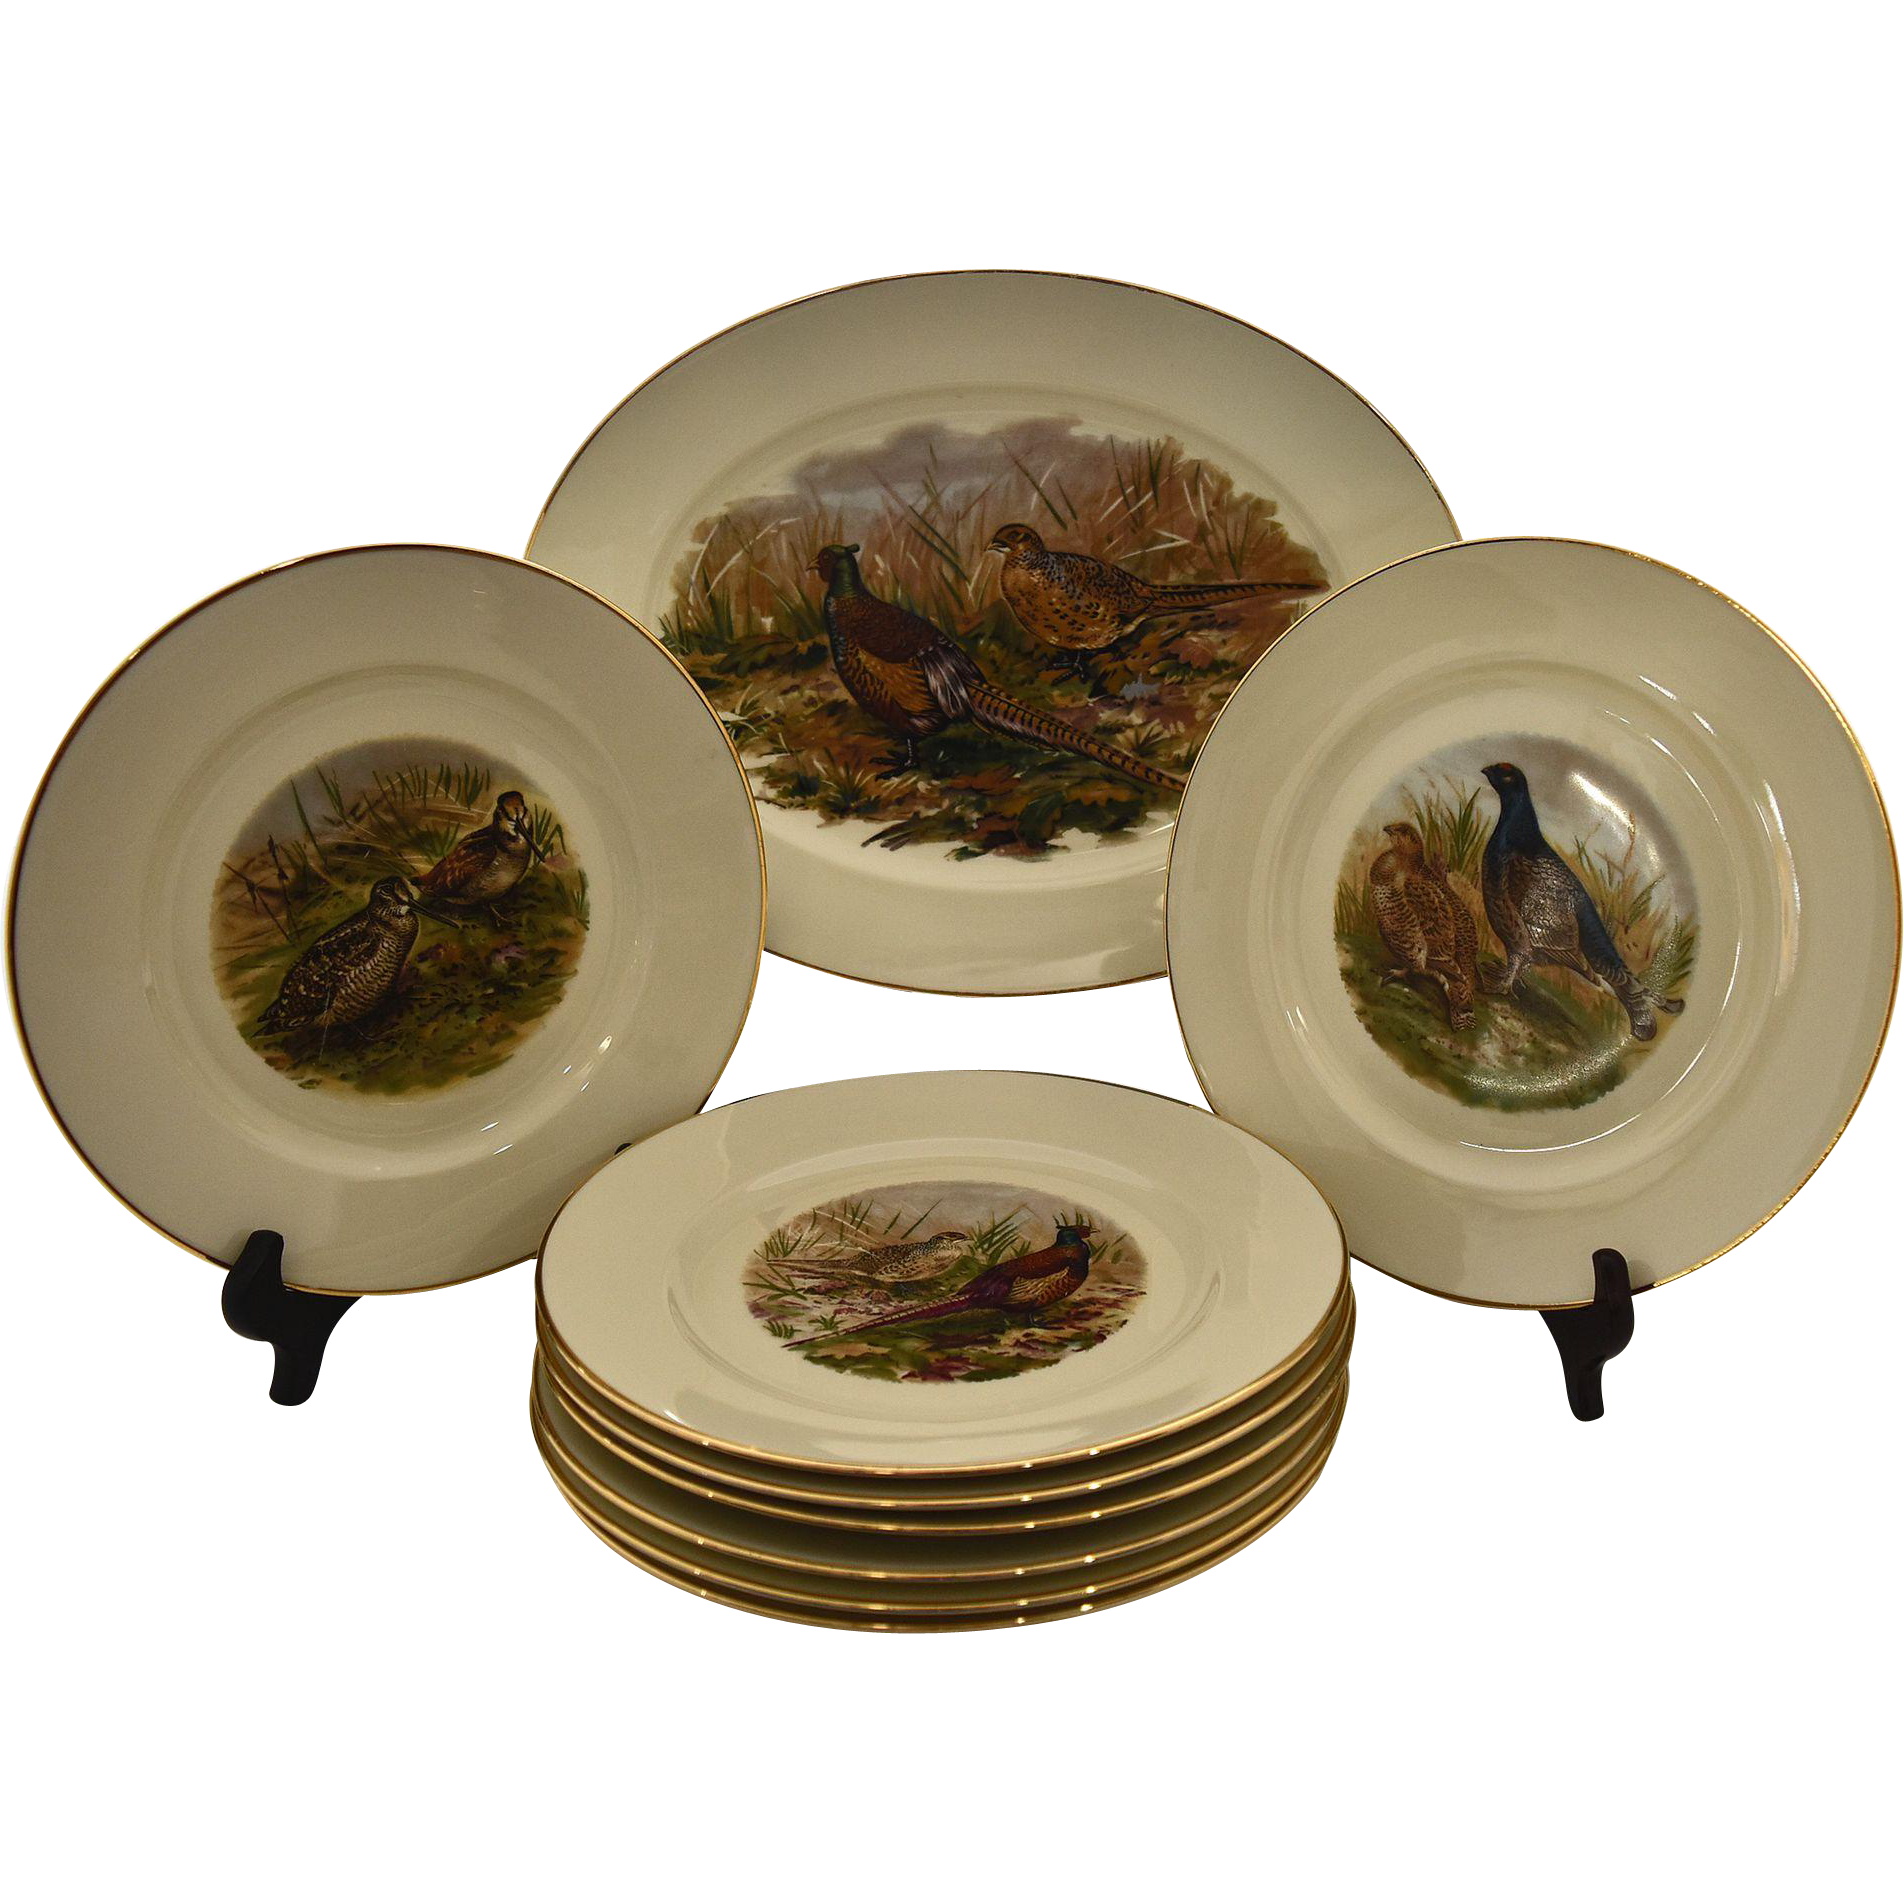 Vintage Bird Plates 30